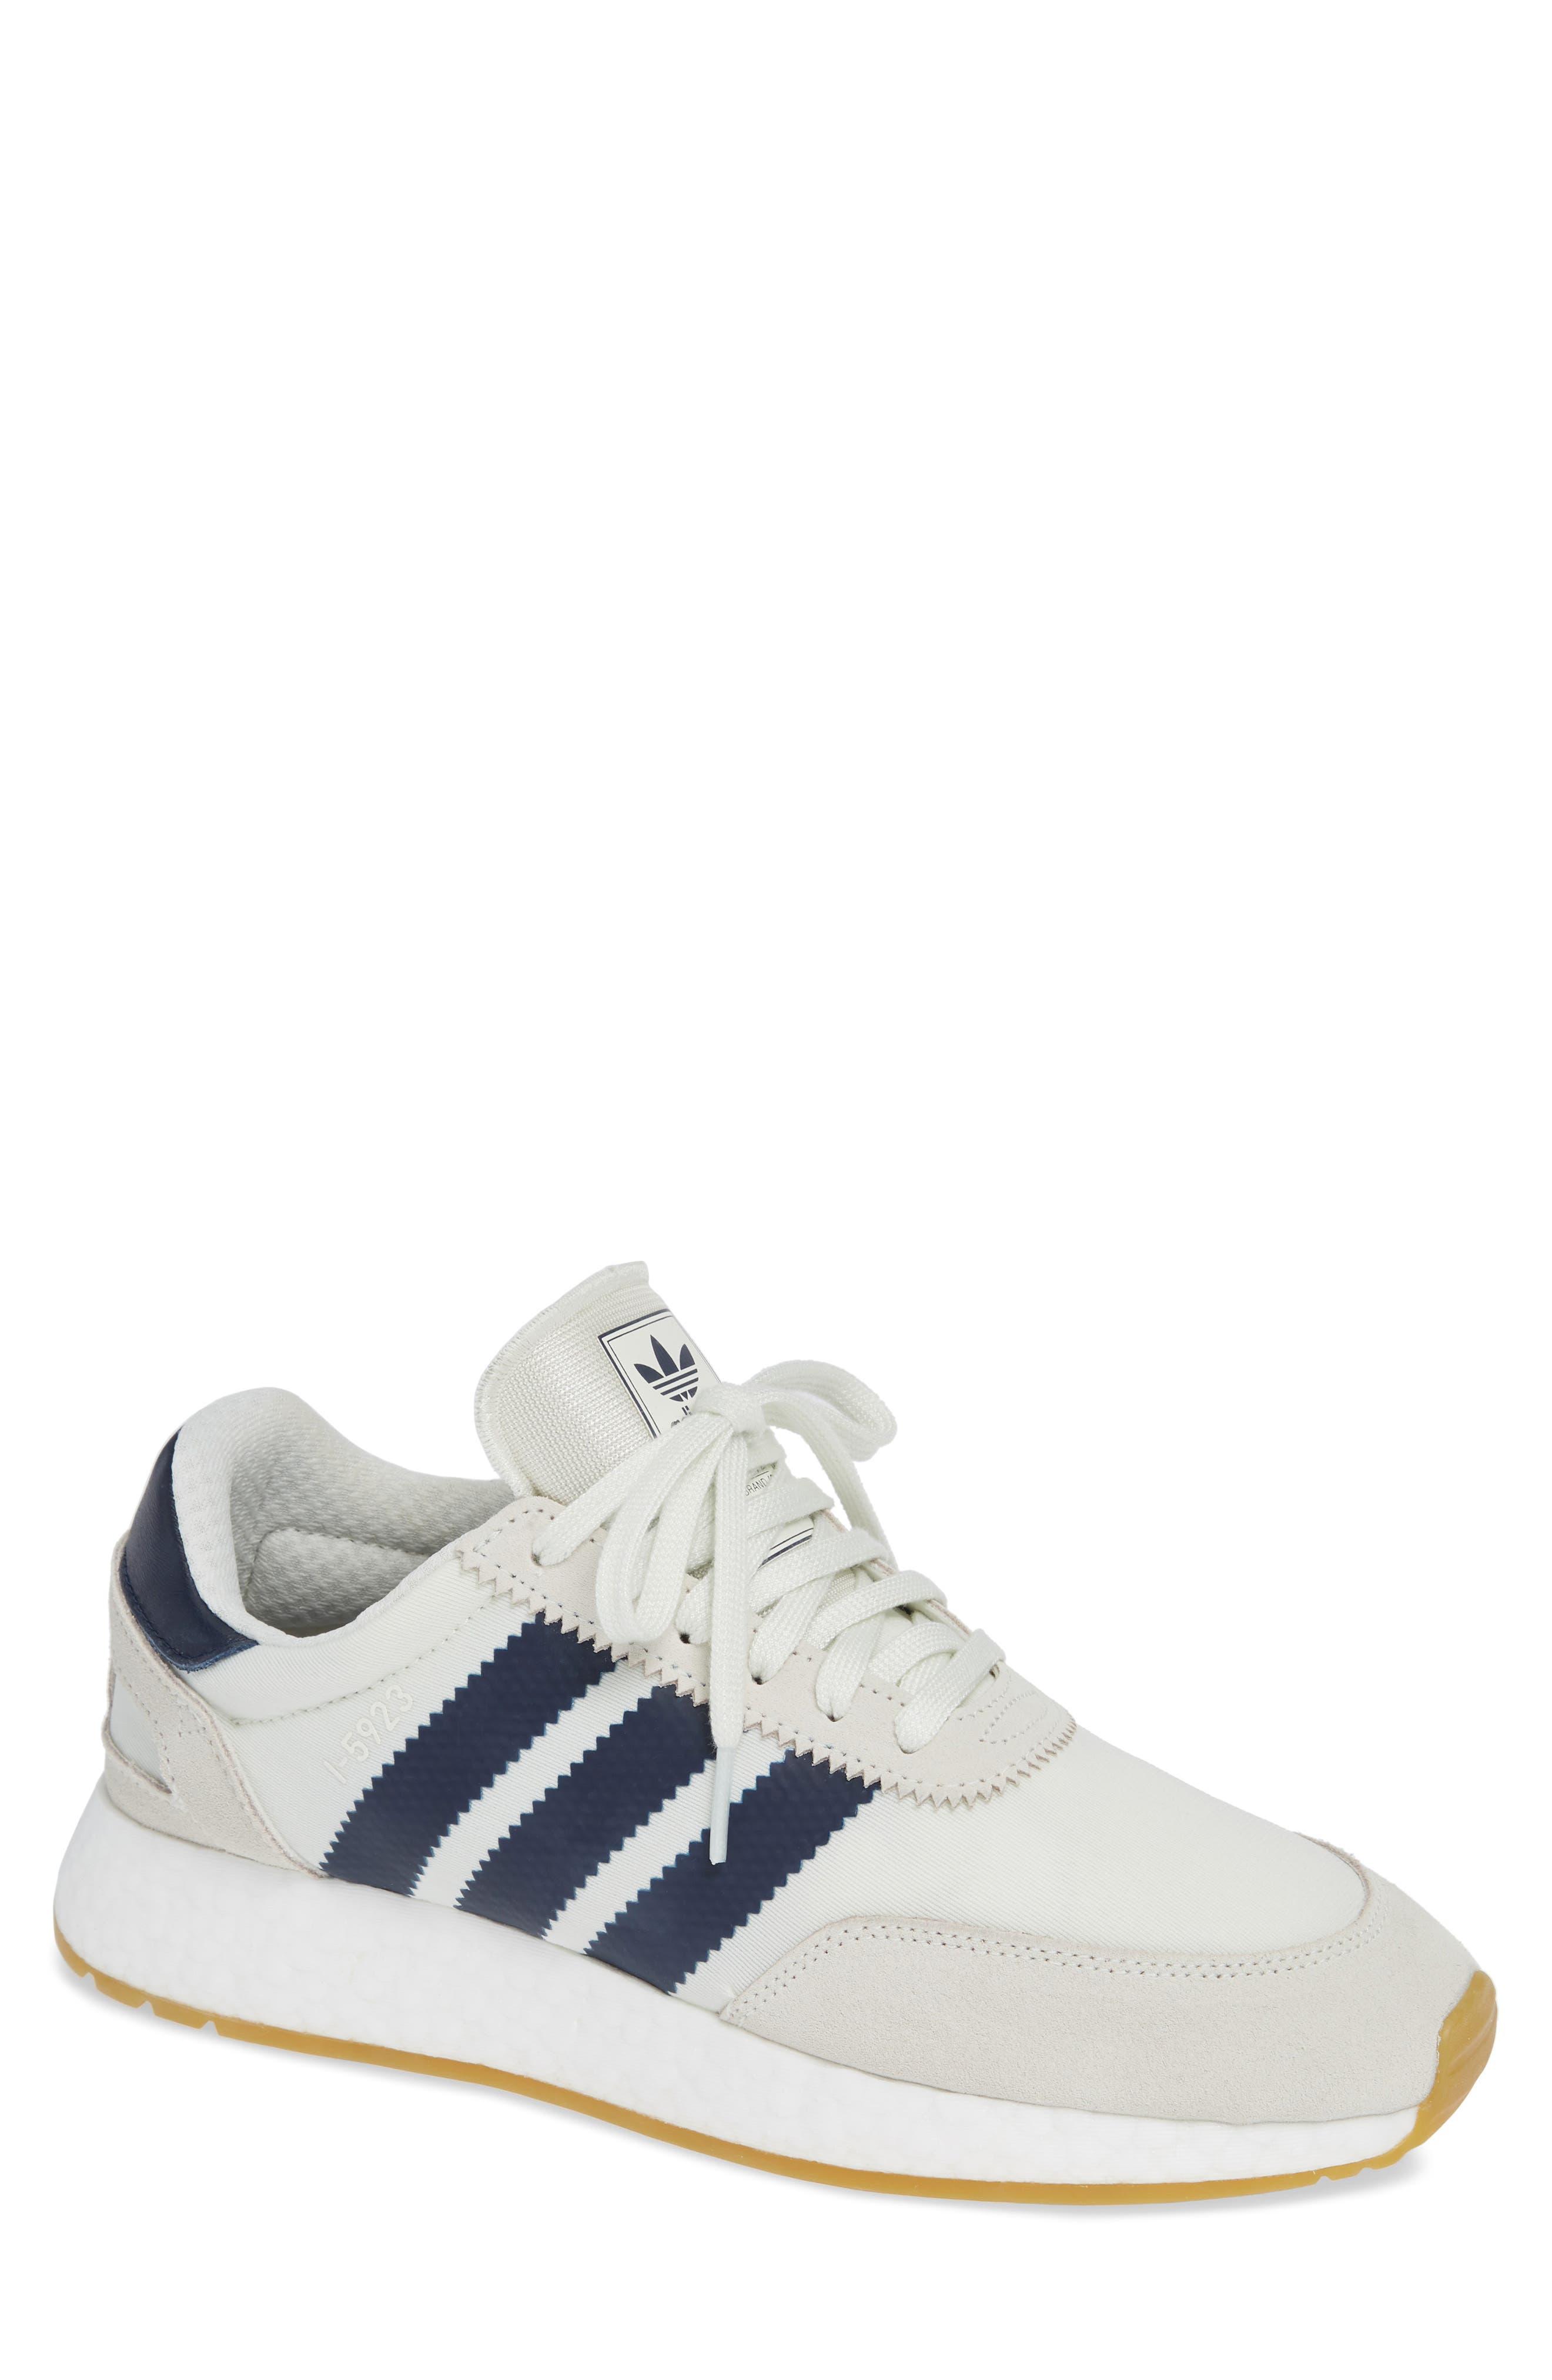 I-5923 Sneaker,                             Main thumbnail 1, color,                             White/ Grey/ Gum